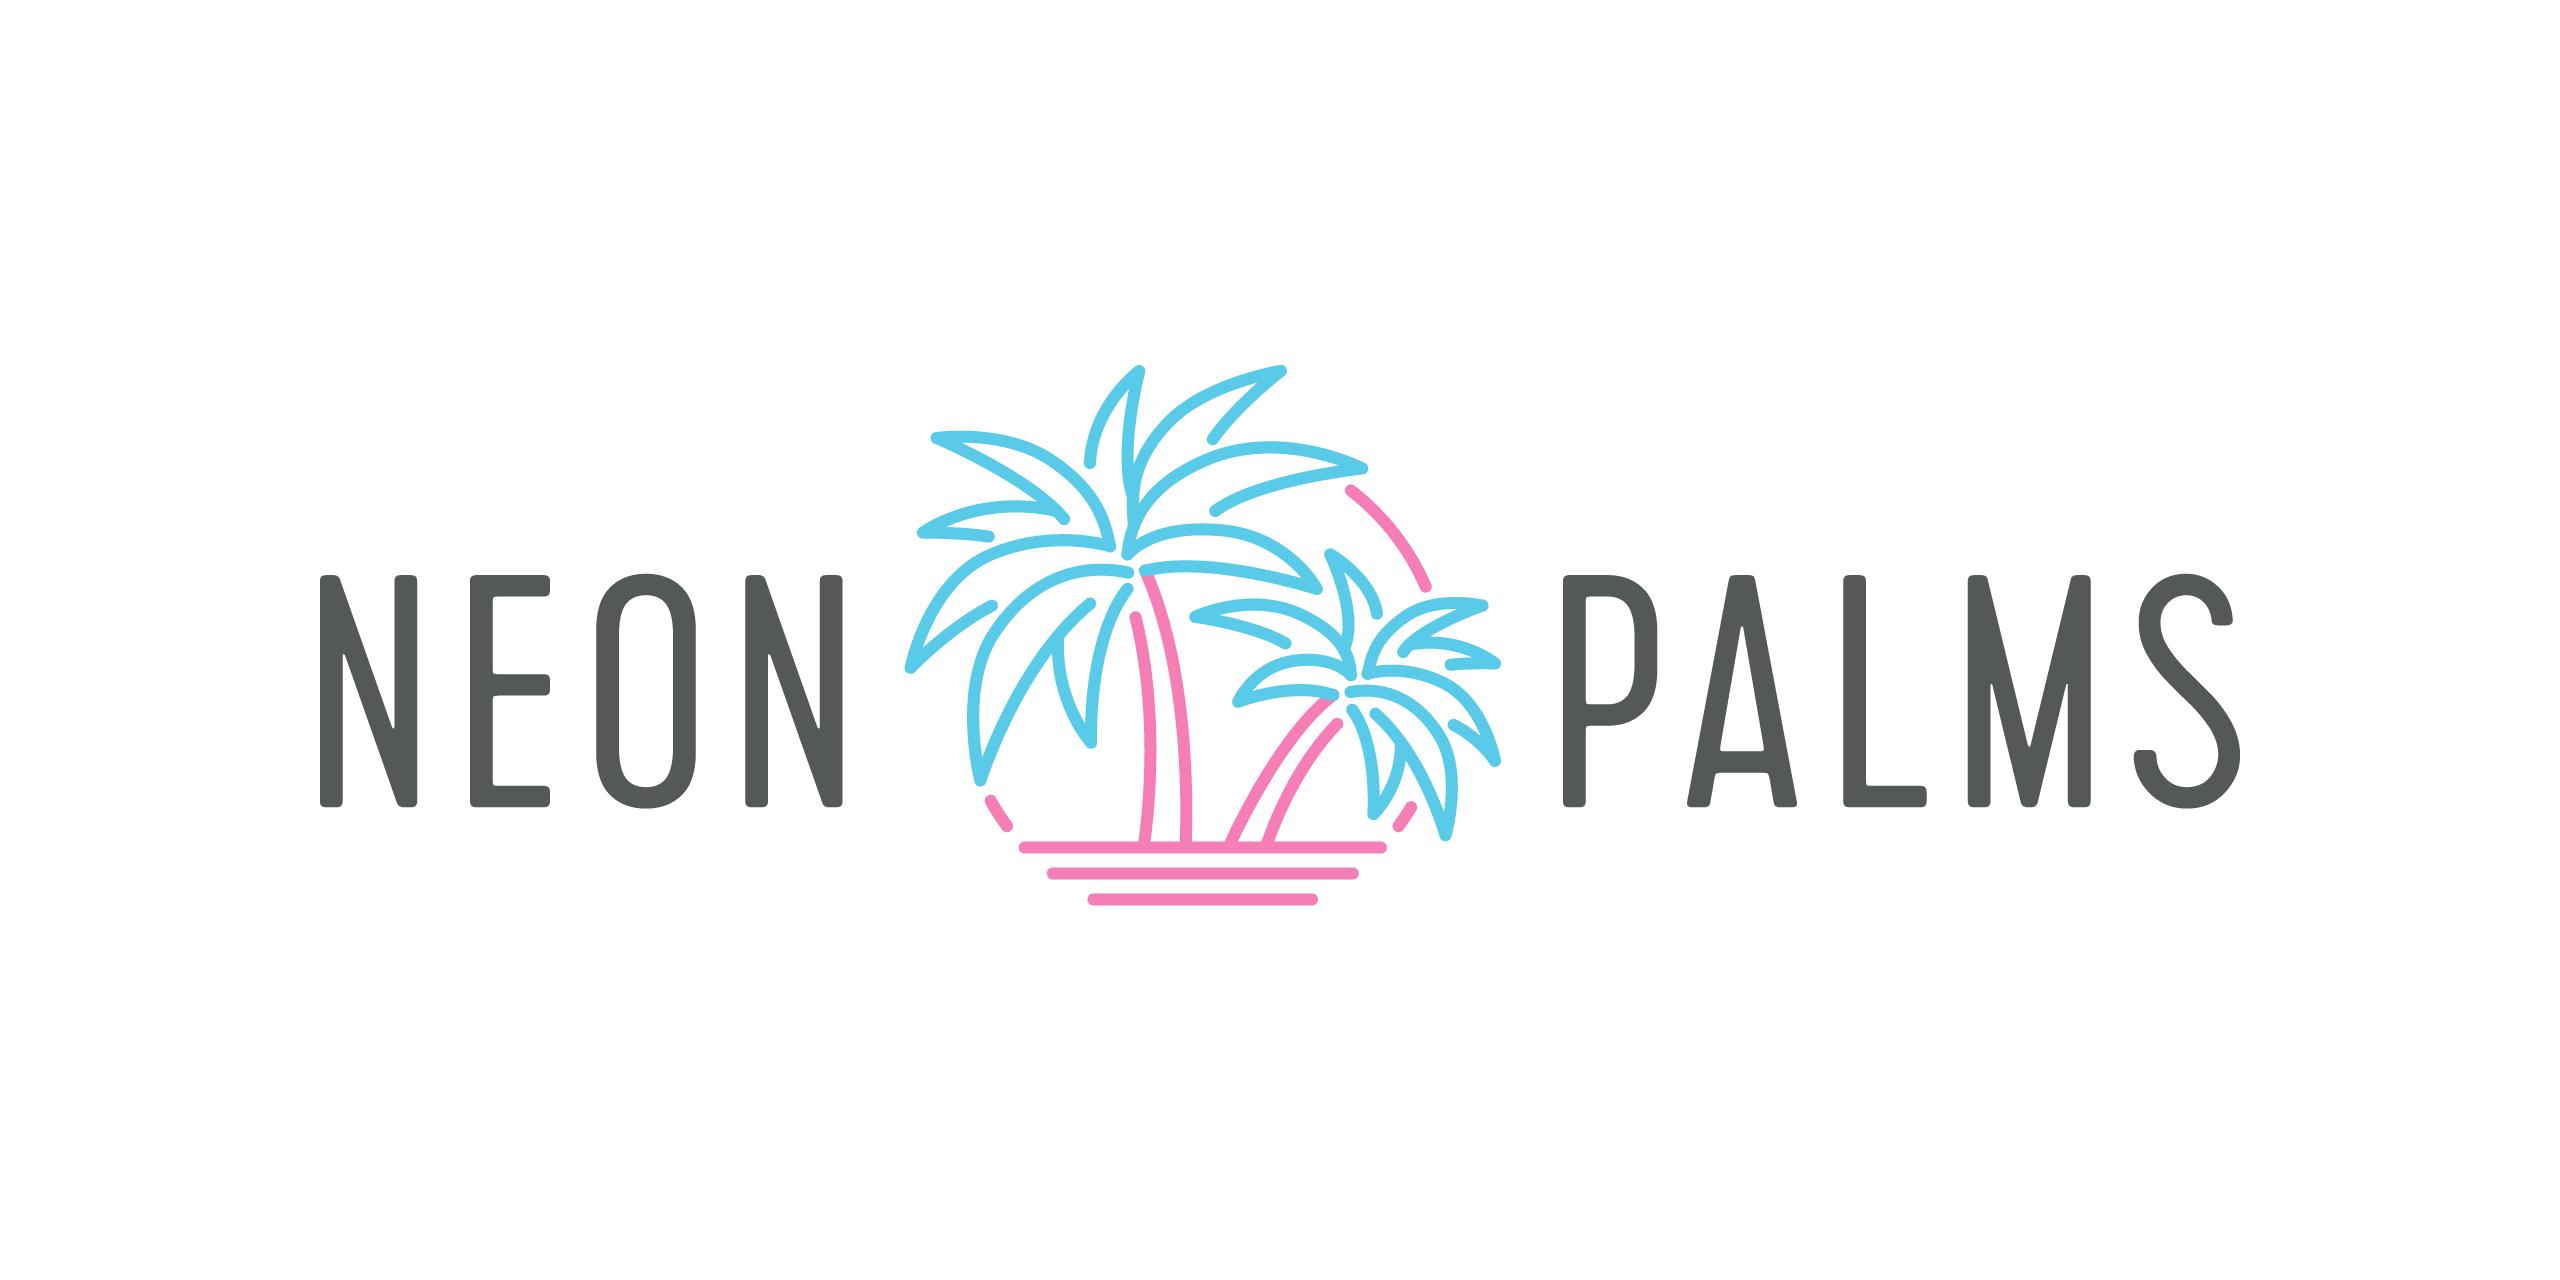 neon palms logo design perth